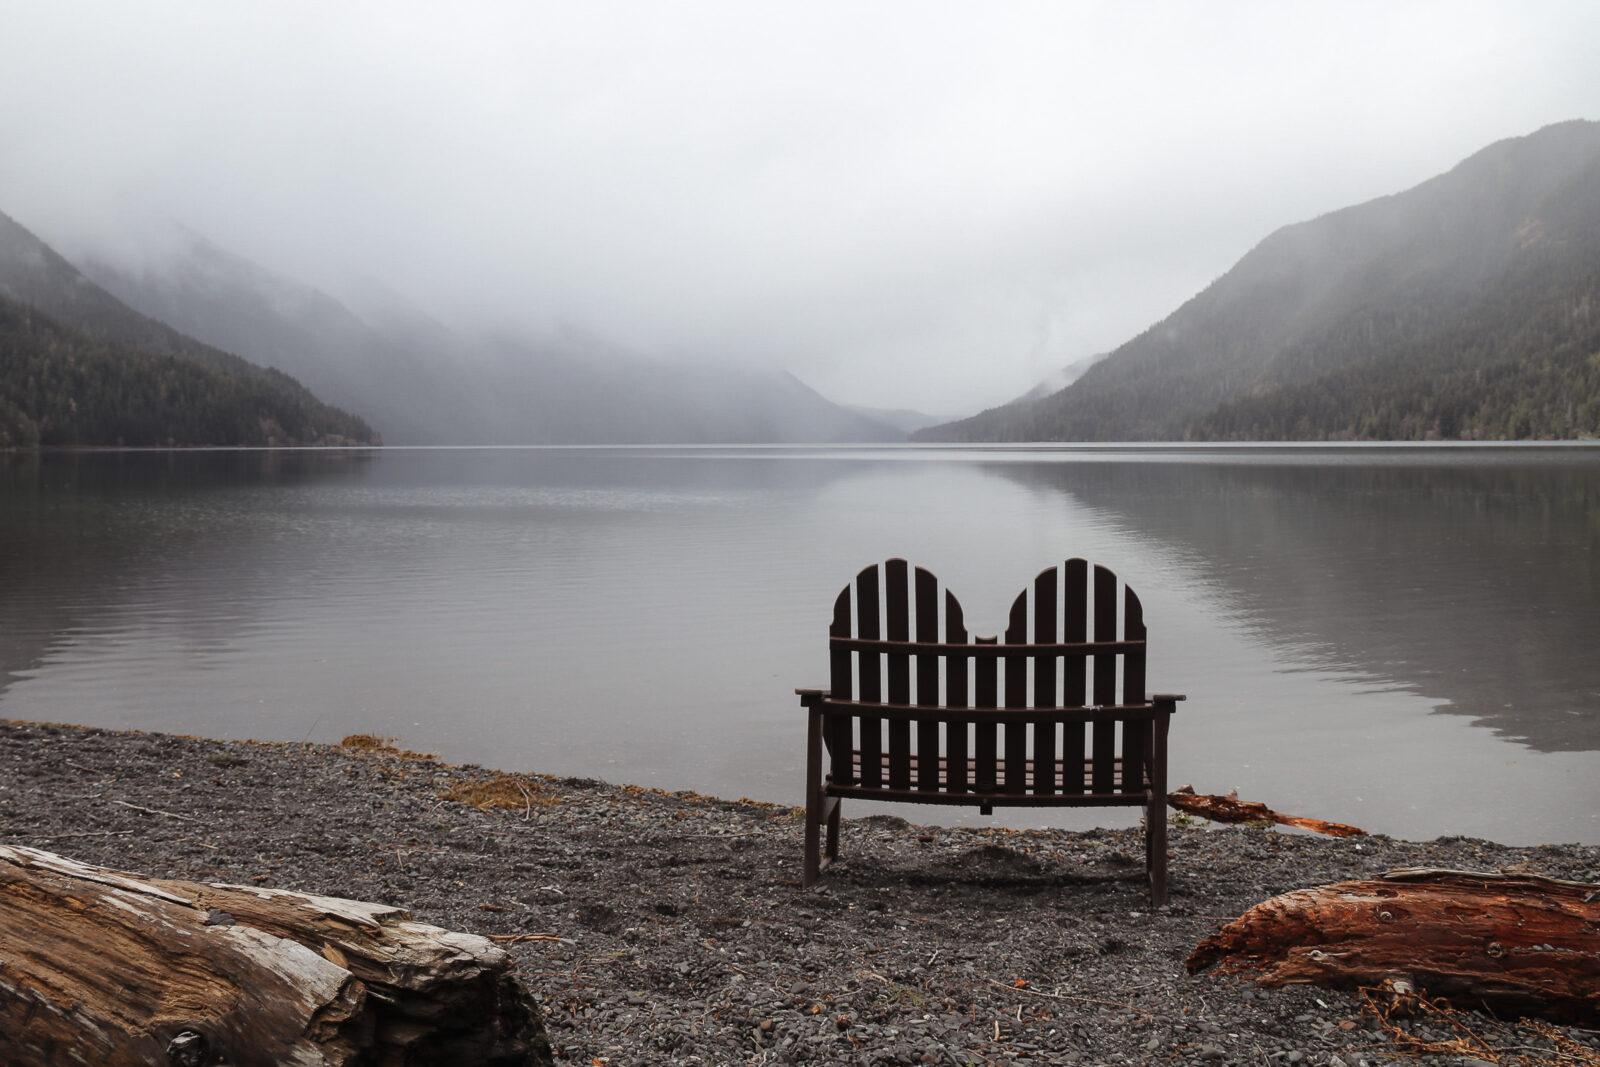 Lake Crescent views